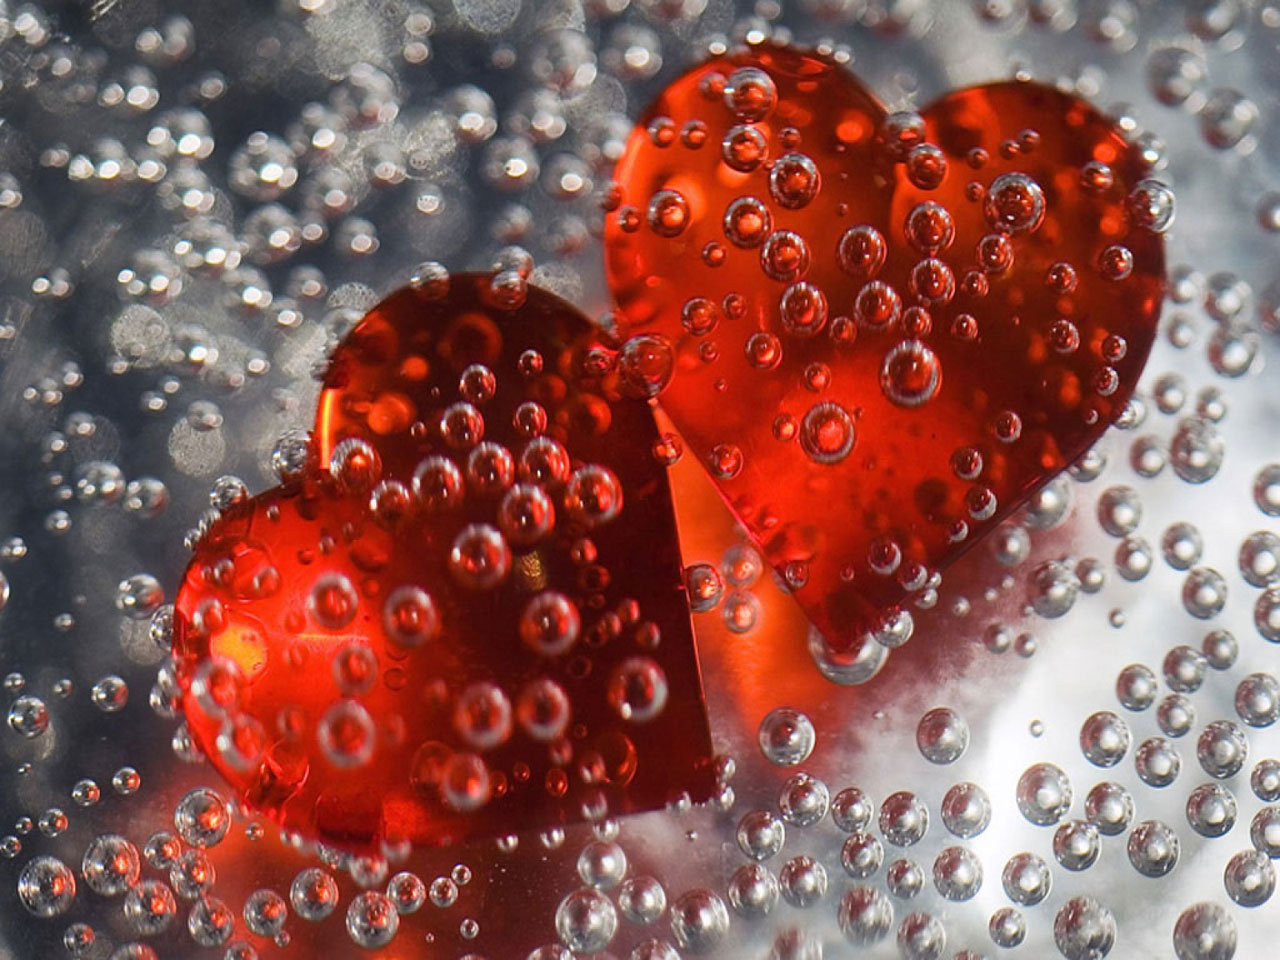 free wallpaper dekstop  red heart wallpaper  heart wallpapers